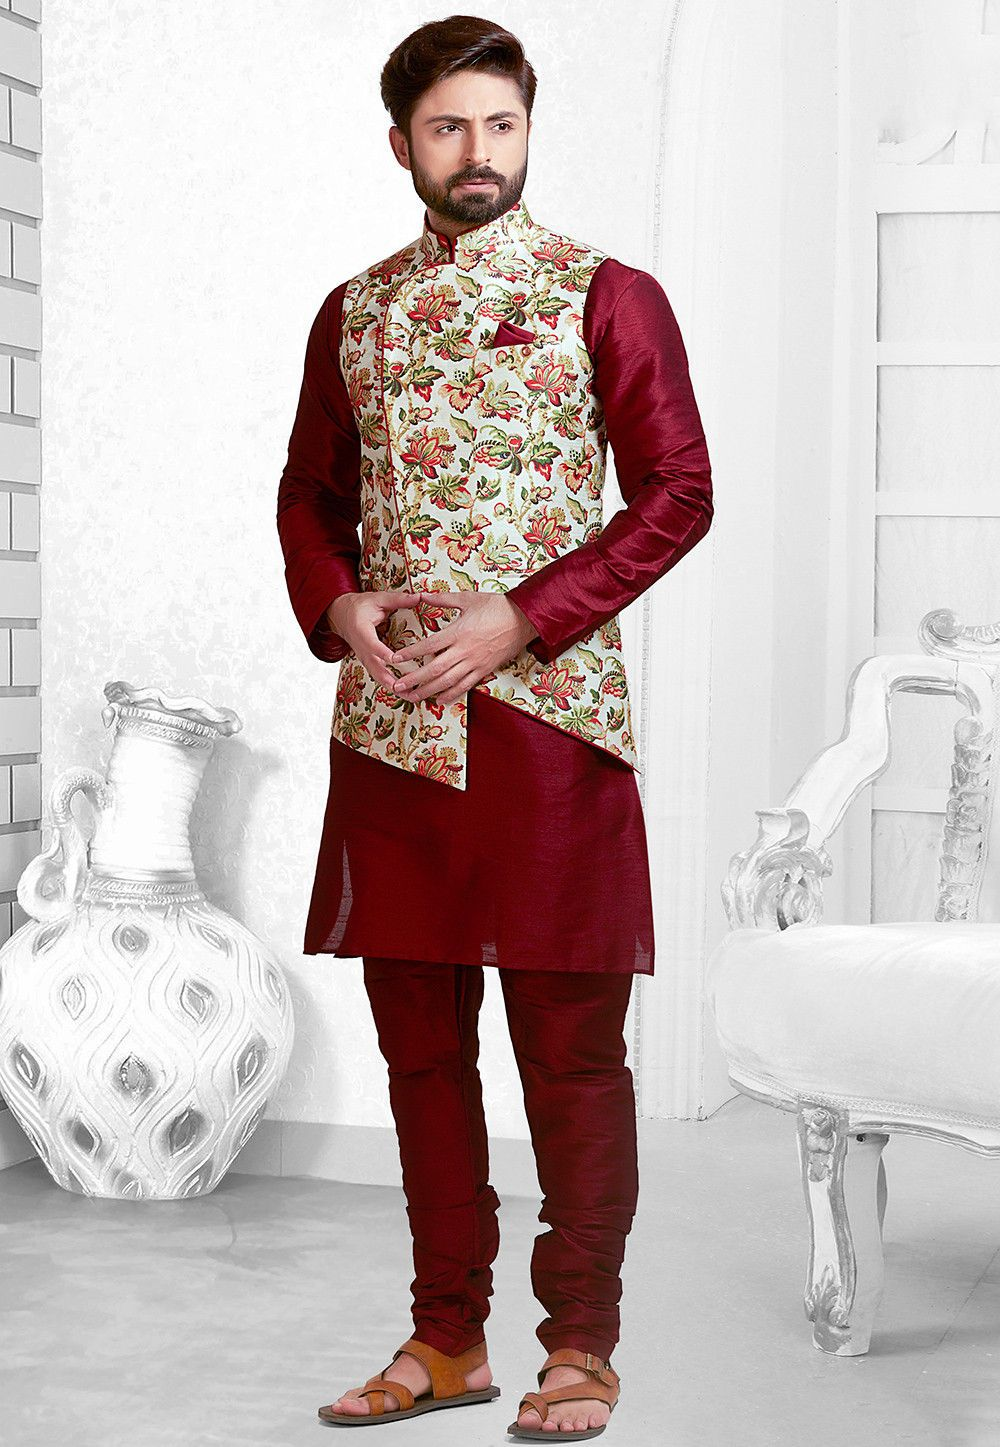 52e8672185 Buy online Digital Printed Art Silk Kurta Pajama Set in Maroon now, Item  code: MHG964, Color: Red, Occasion: Wedding, Festive, Fabric: Art Silk, ...